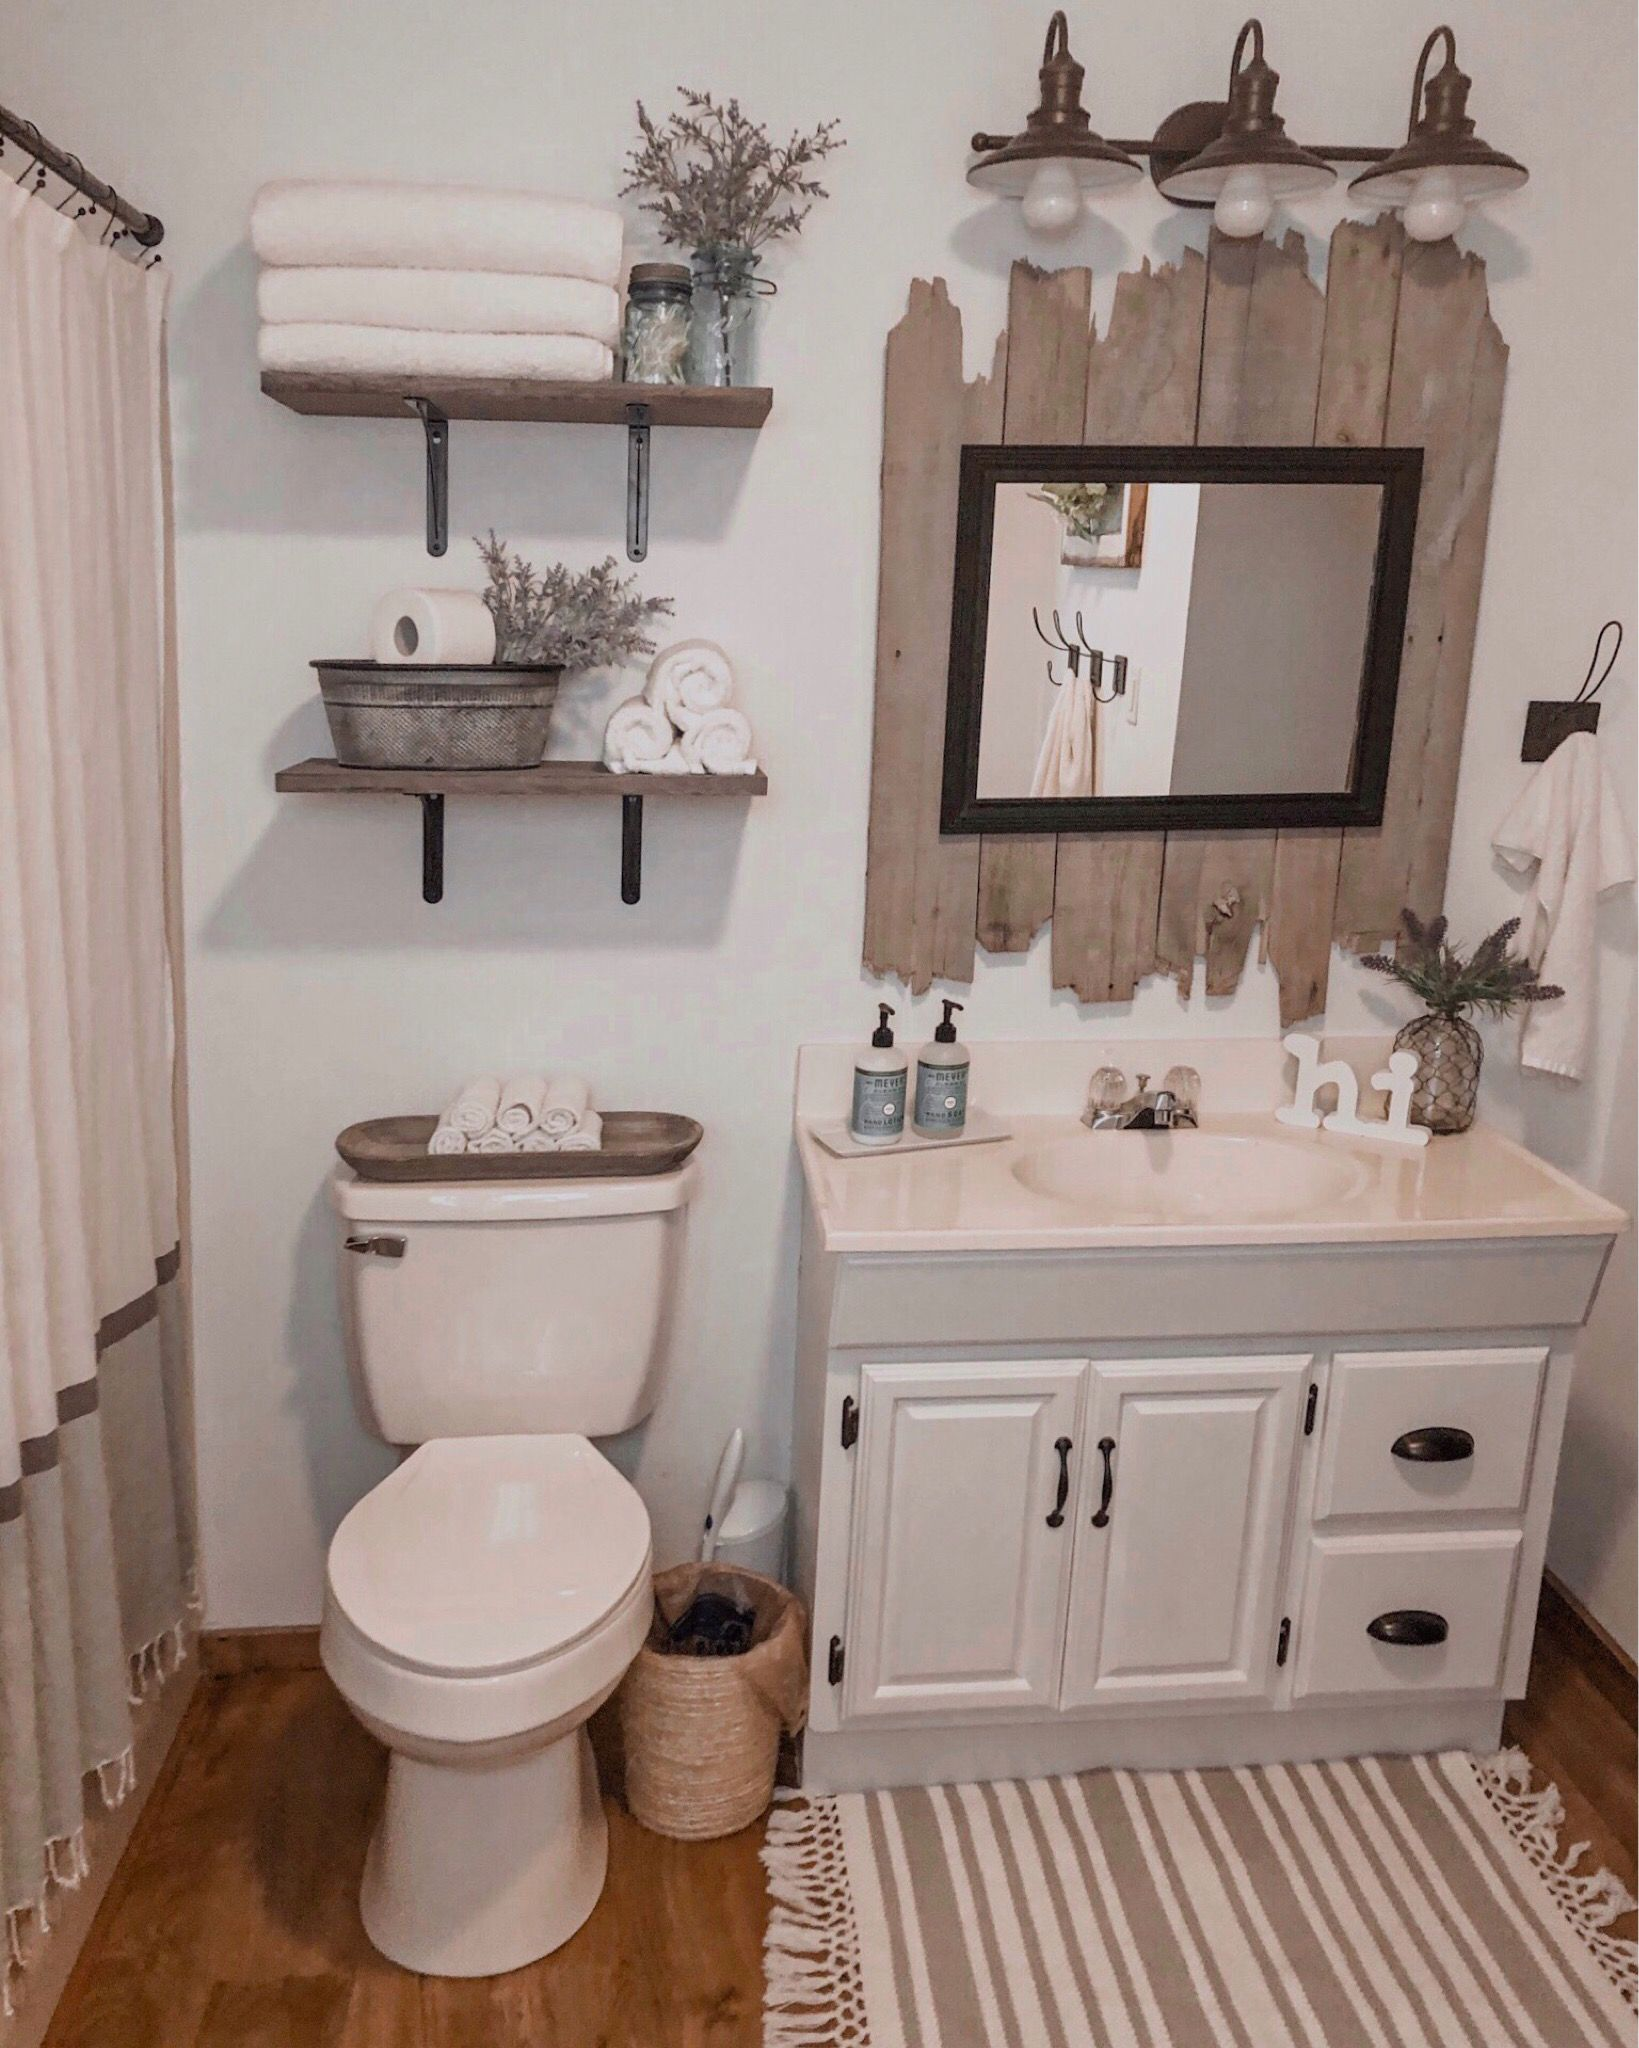 Farmhouse Bathroom Bathroom Decor Rustic Bathroom Rustic